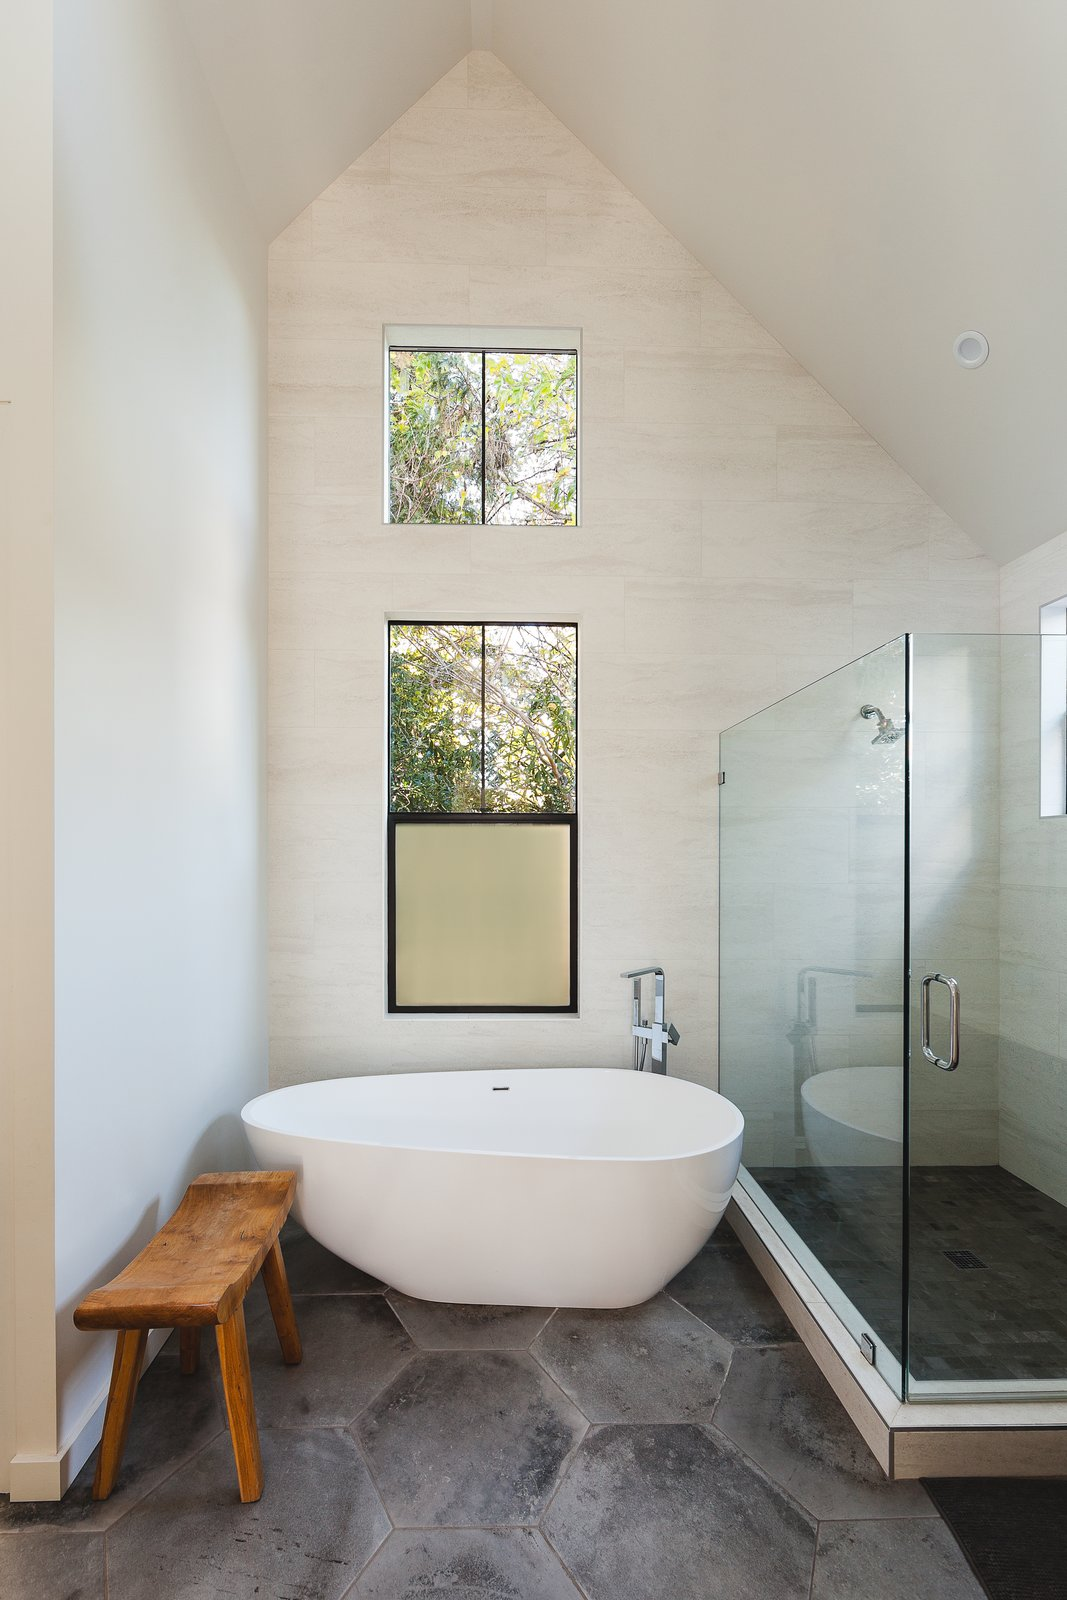 Bath, Porcelain Tile, Freestanding, Ceiling, Soaking, and Corner master bathroom  Bath Corner Freestanding Photos from Sonoma Farmhouse